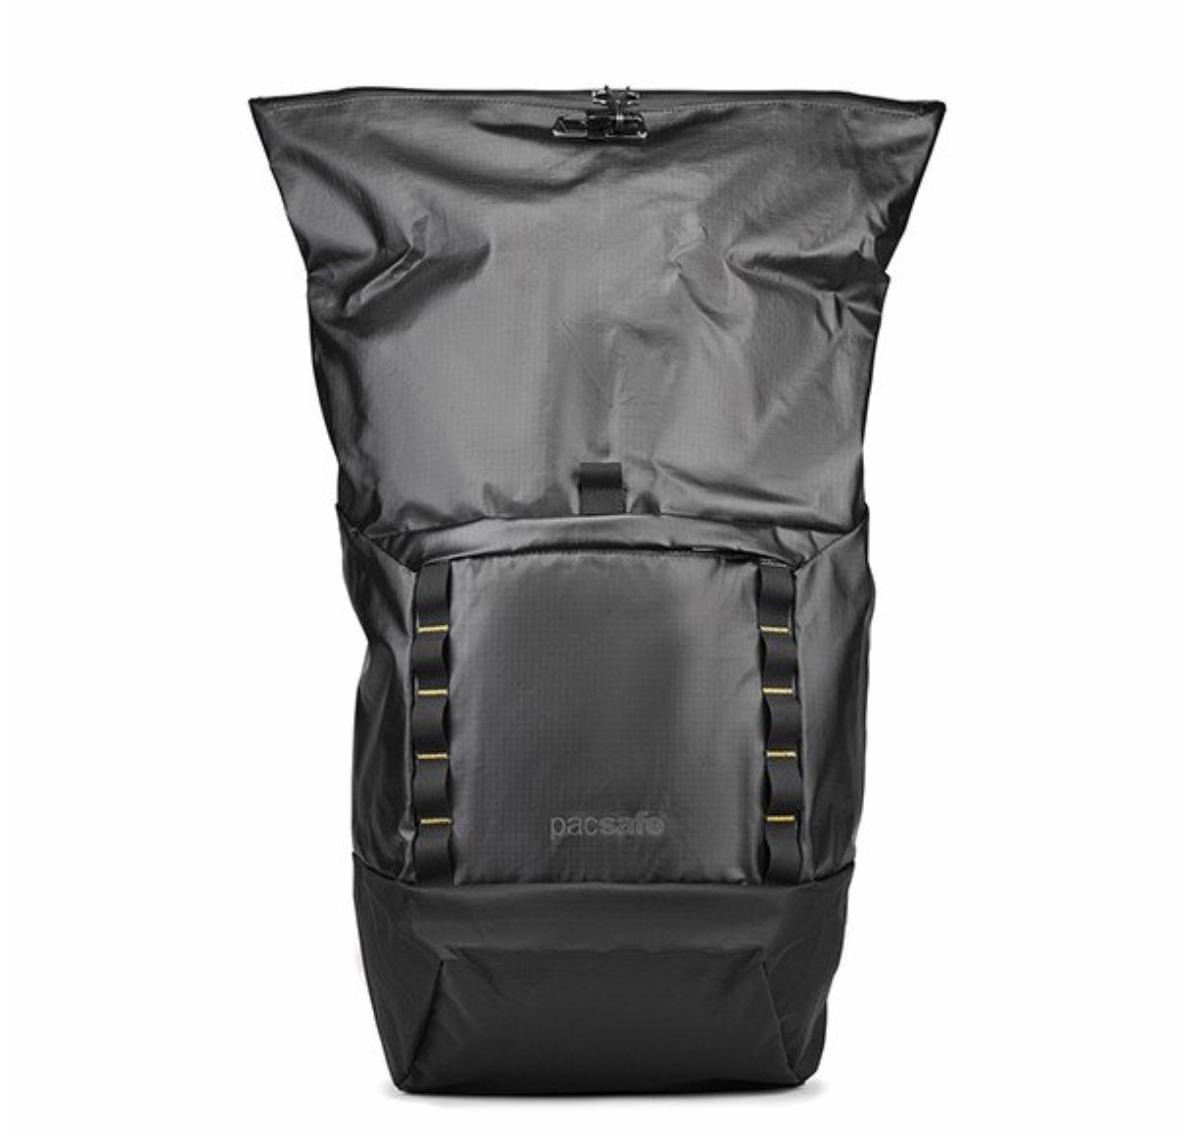 f:id:thebackpack:20190818095056p:plain